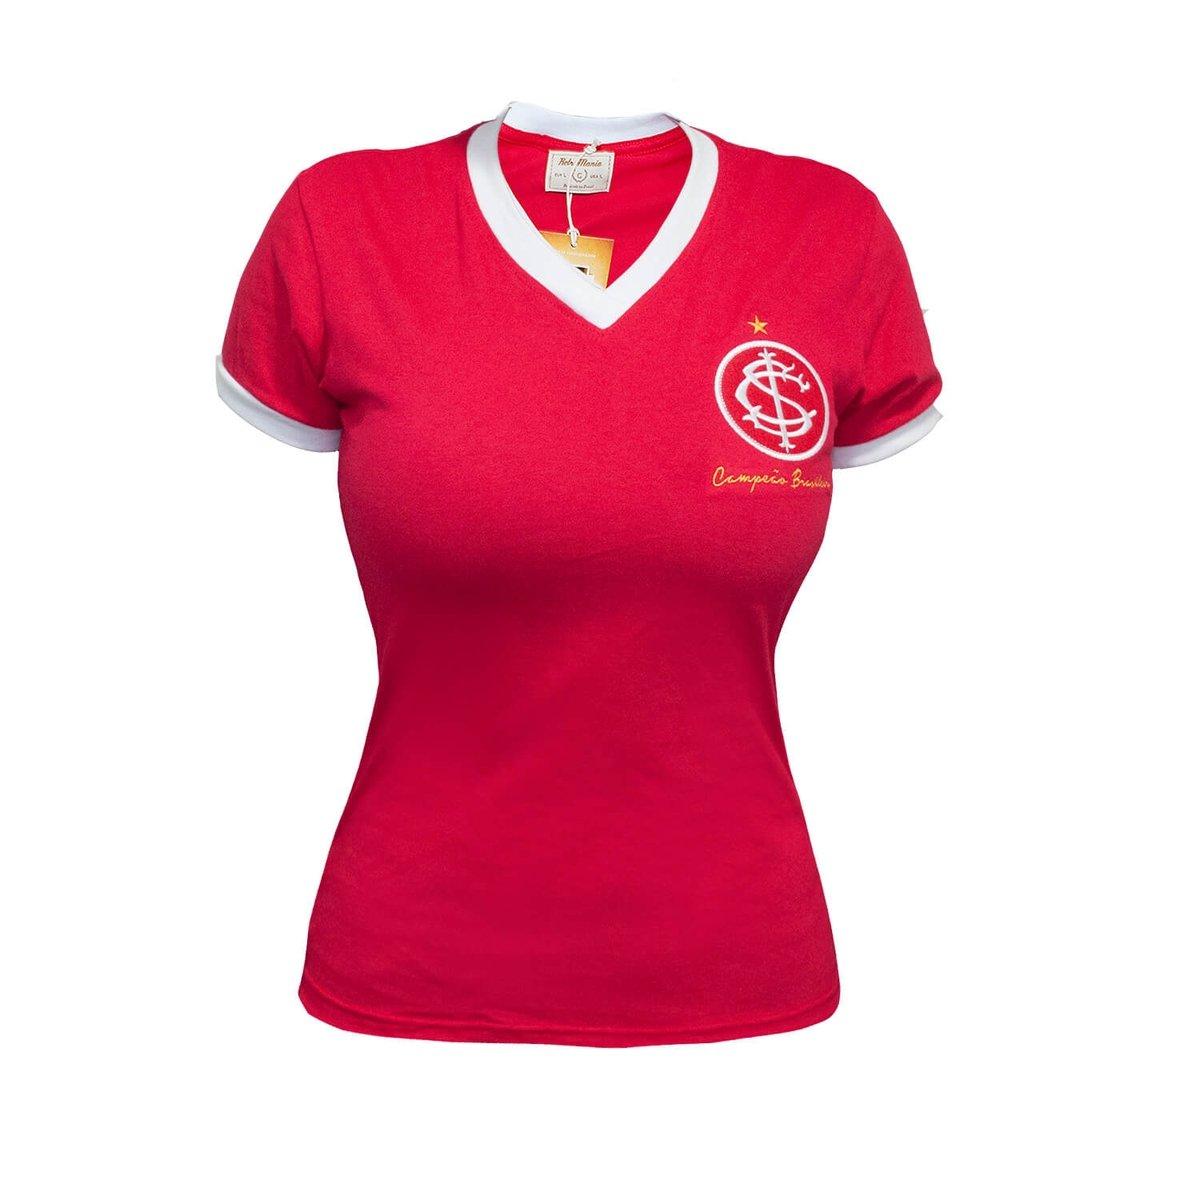 Camisa Camisa Feminina Internacional Retrô Vermelho 1975 Mania Retrô zdxq5z